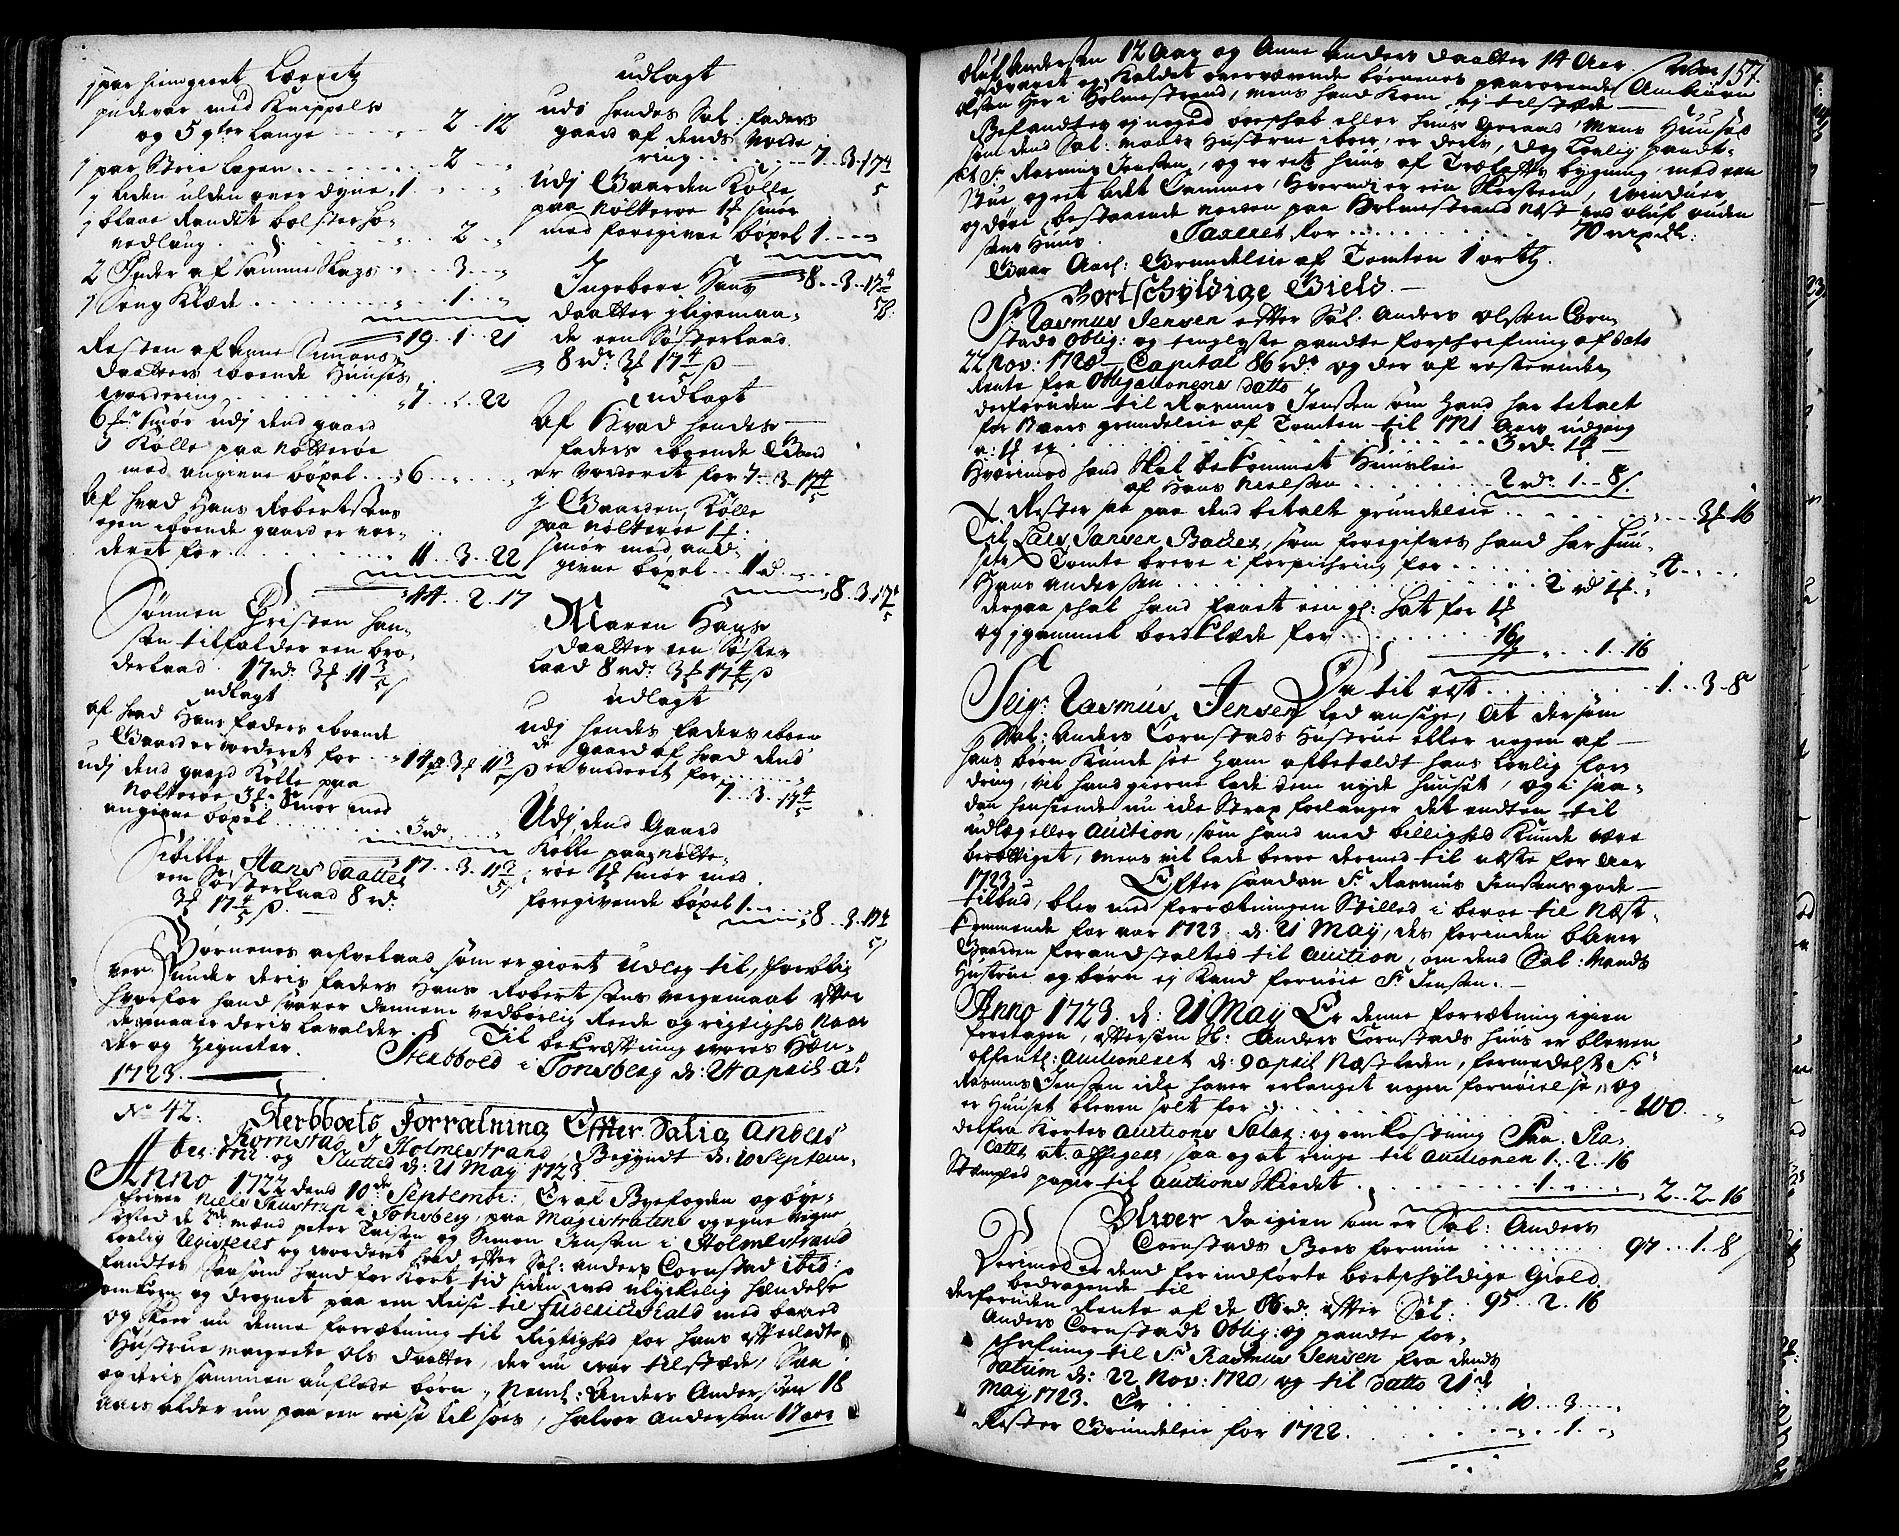 SAKO, Tønsberg byfogd, H/Hb/L0002: Skifteprotokoll, 1720-1744, s. 156b-157a